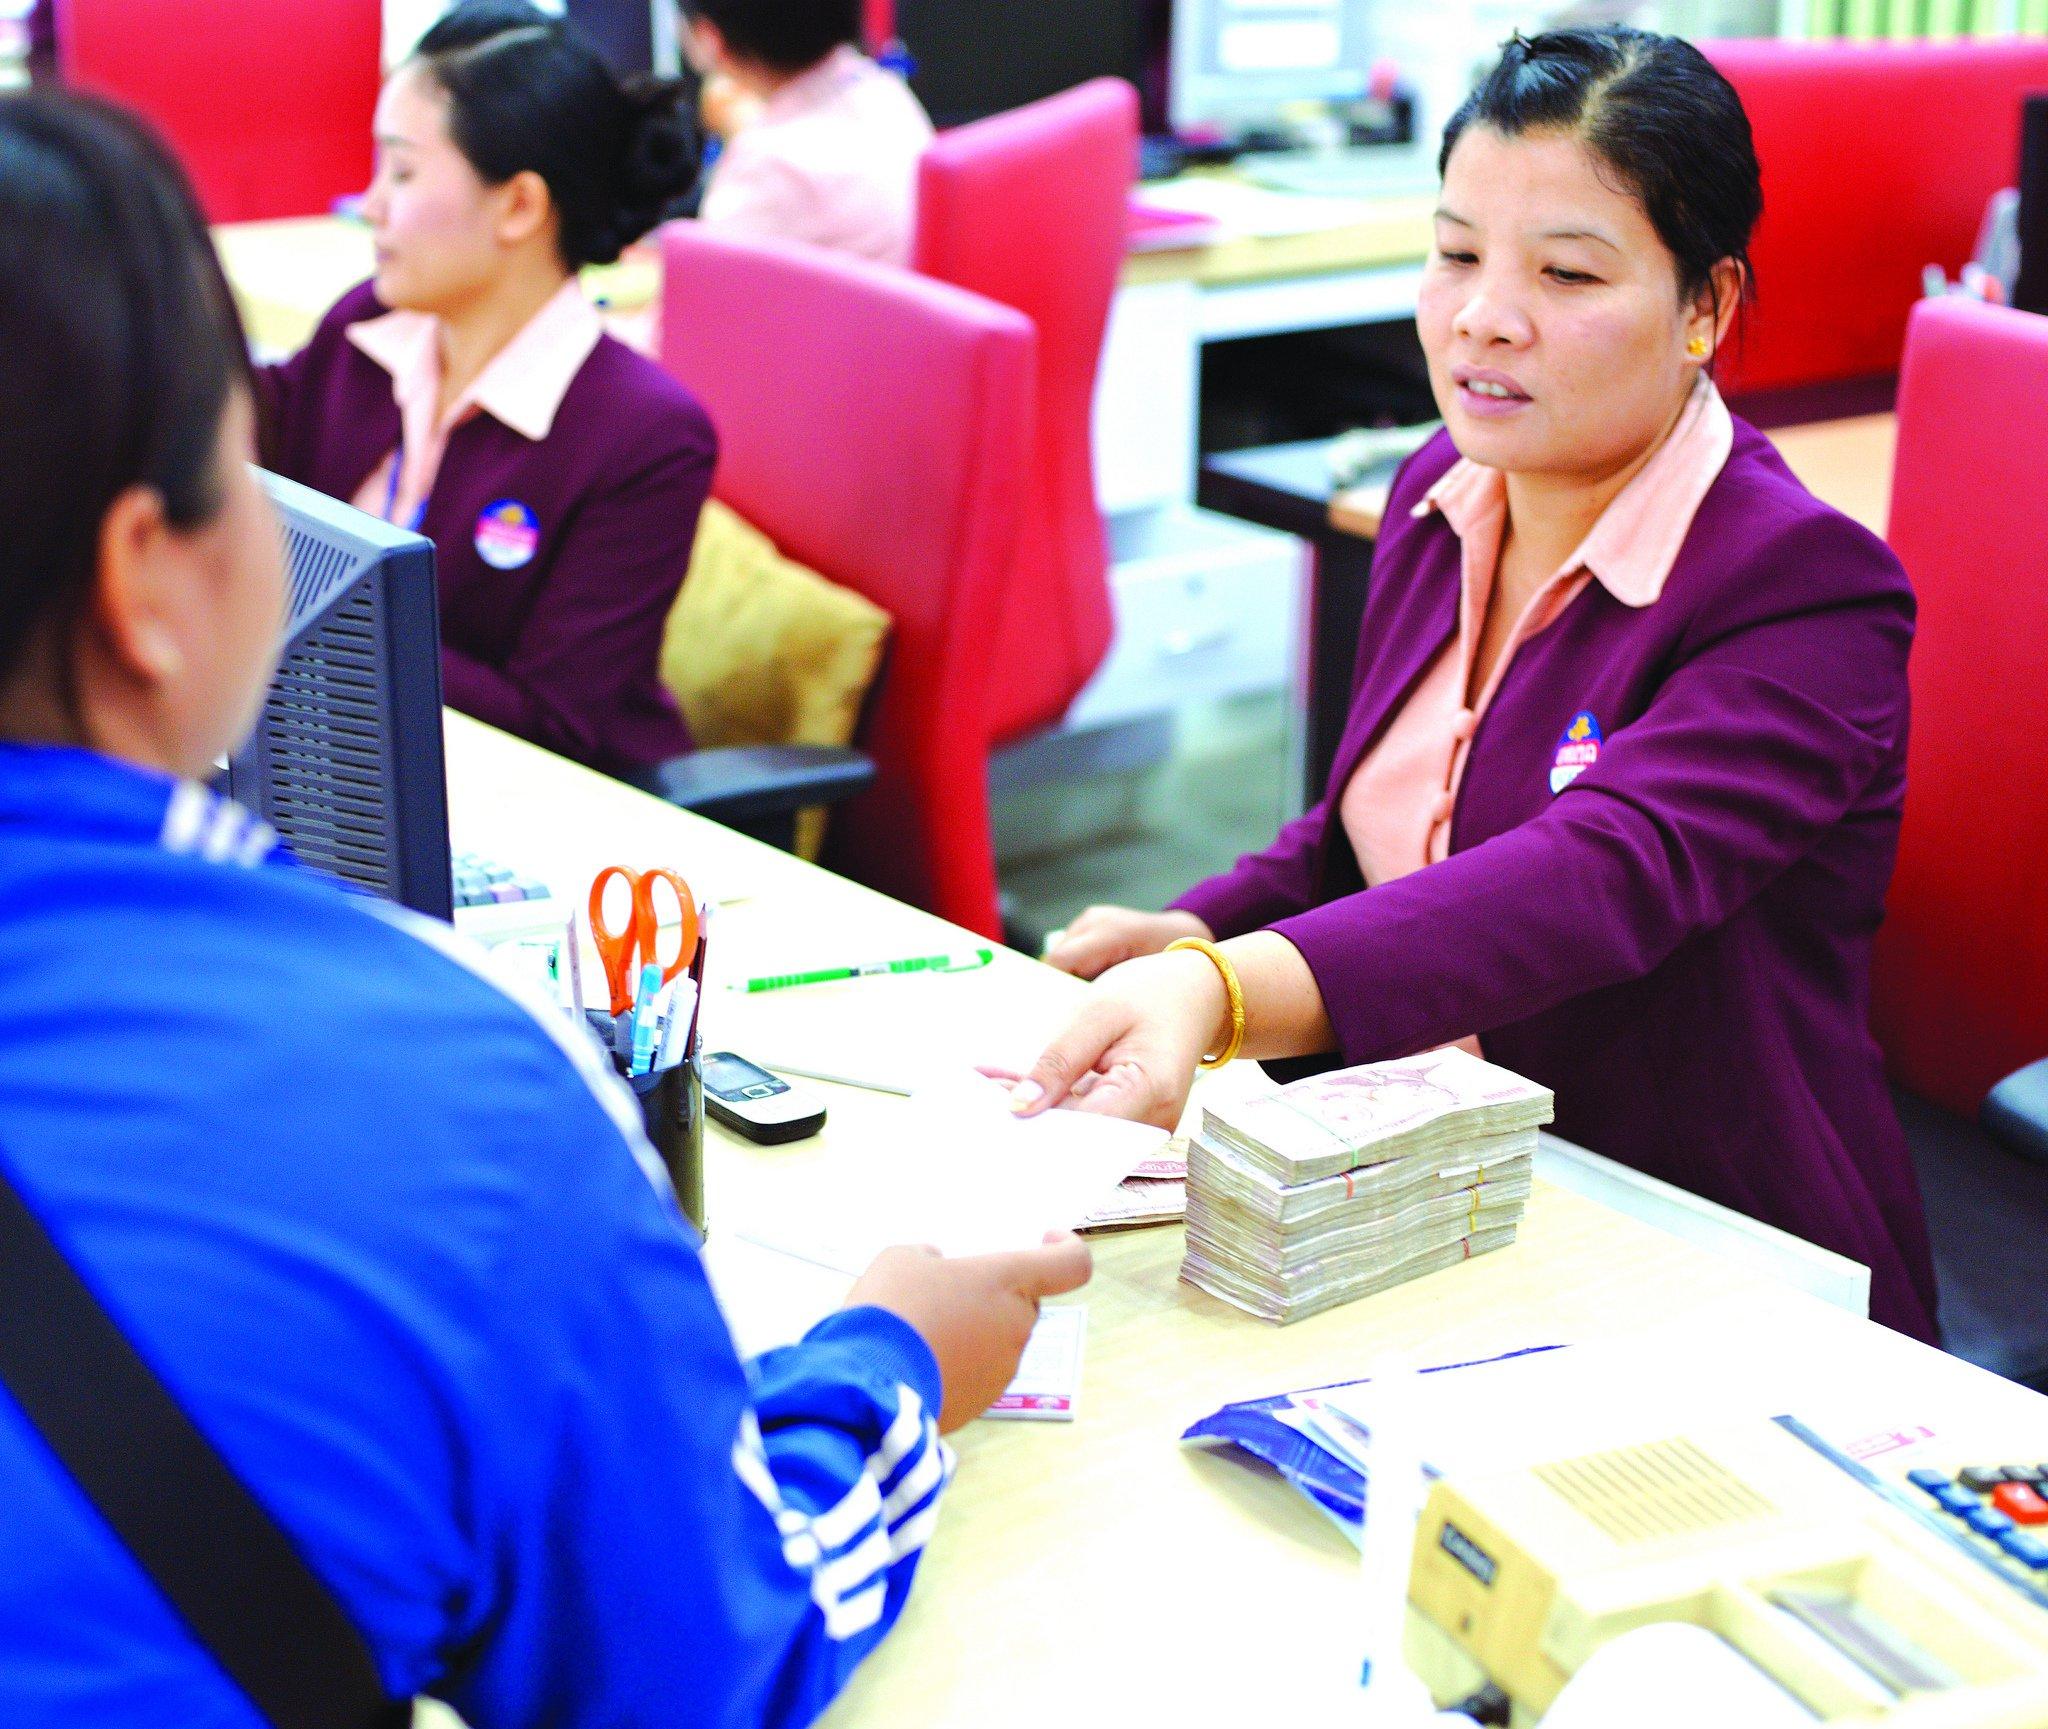 Staff at BCEL Bank, Vientiane, Laos. Photo: Stanislas Fradelizi/World Bank (CC BY-NC-ND 2.0)